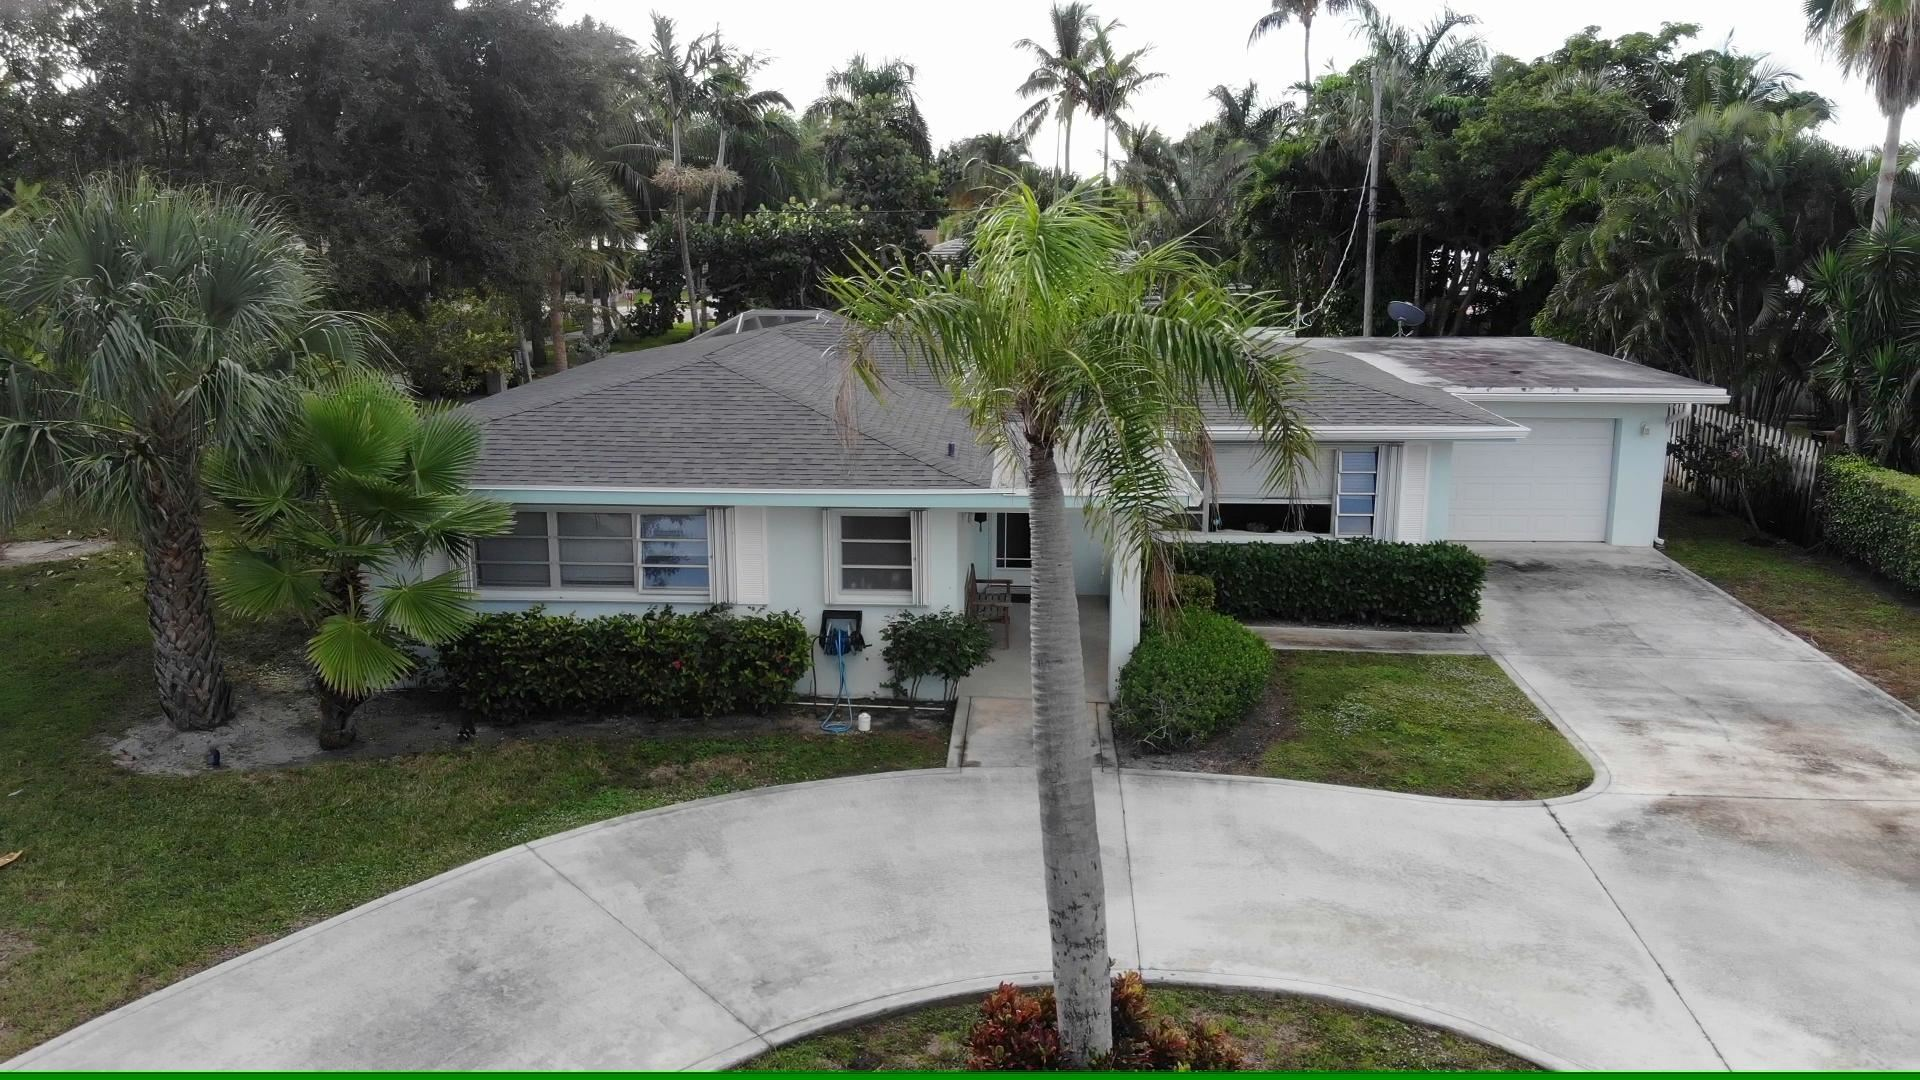 300 Bravado Lane, West Palm Beach, Florida